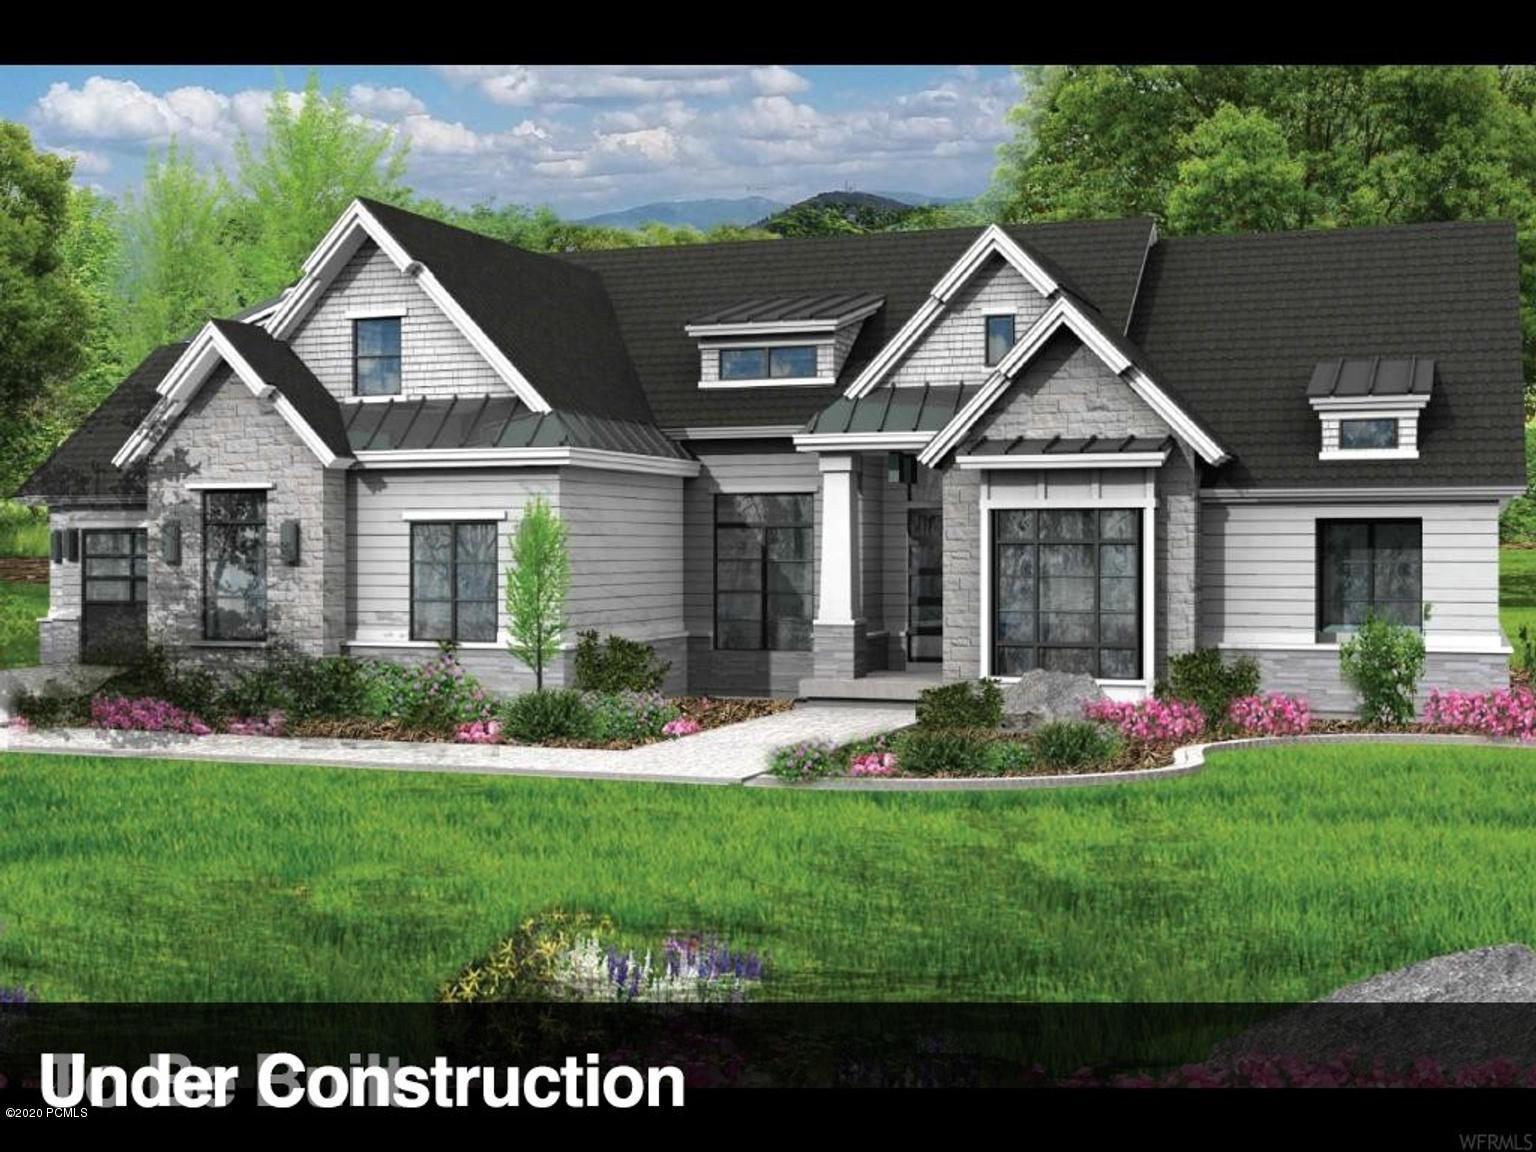 236 1850 E, Heber City, Utah 84032, 3 Bedrooms Bedrooms, ,Single Family,For Sale,1850 E,12003639